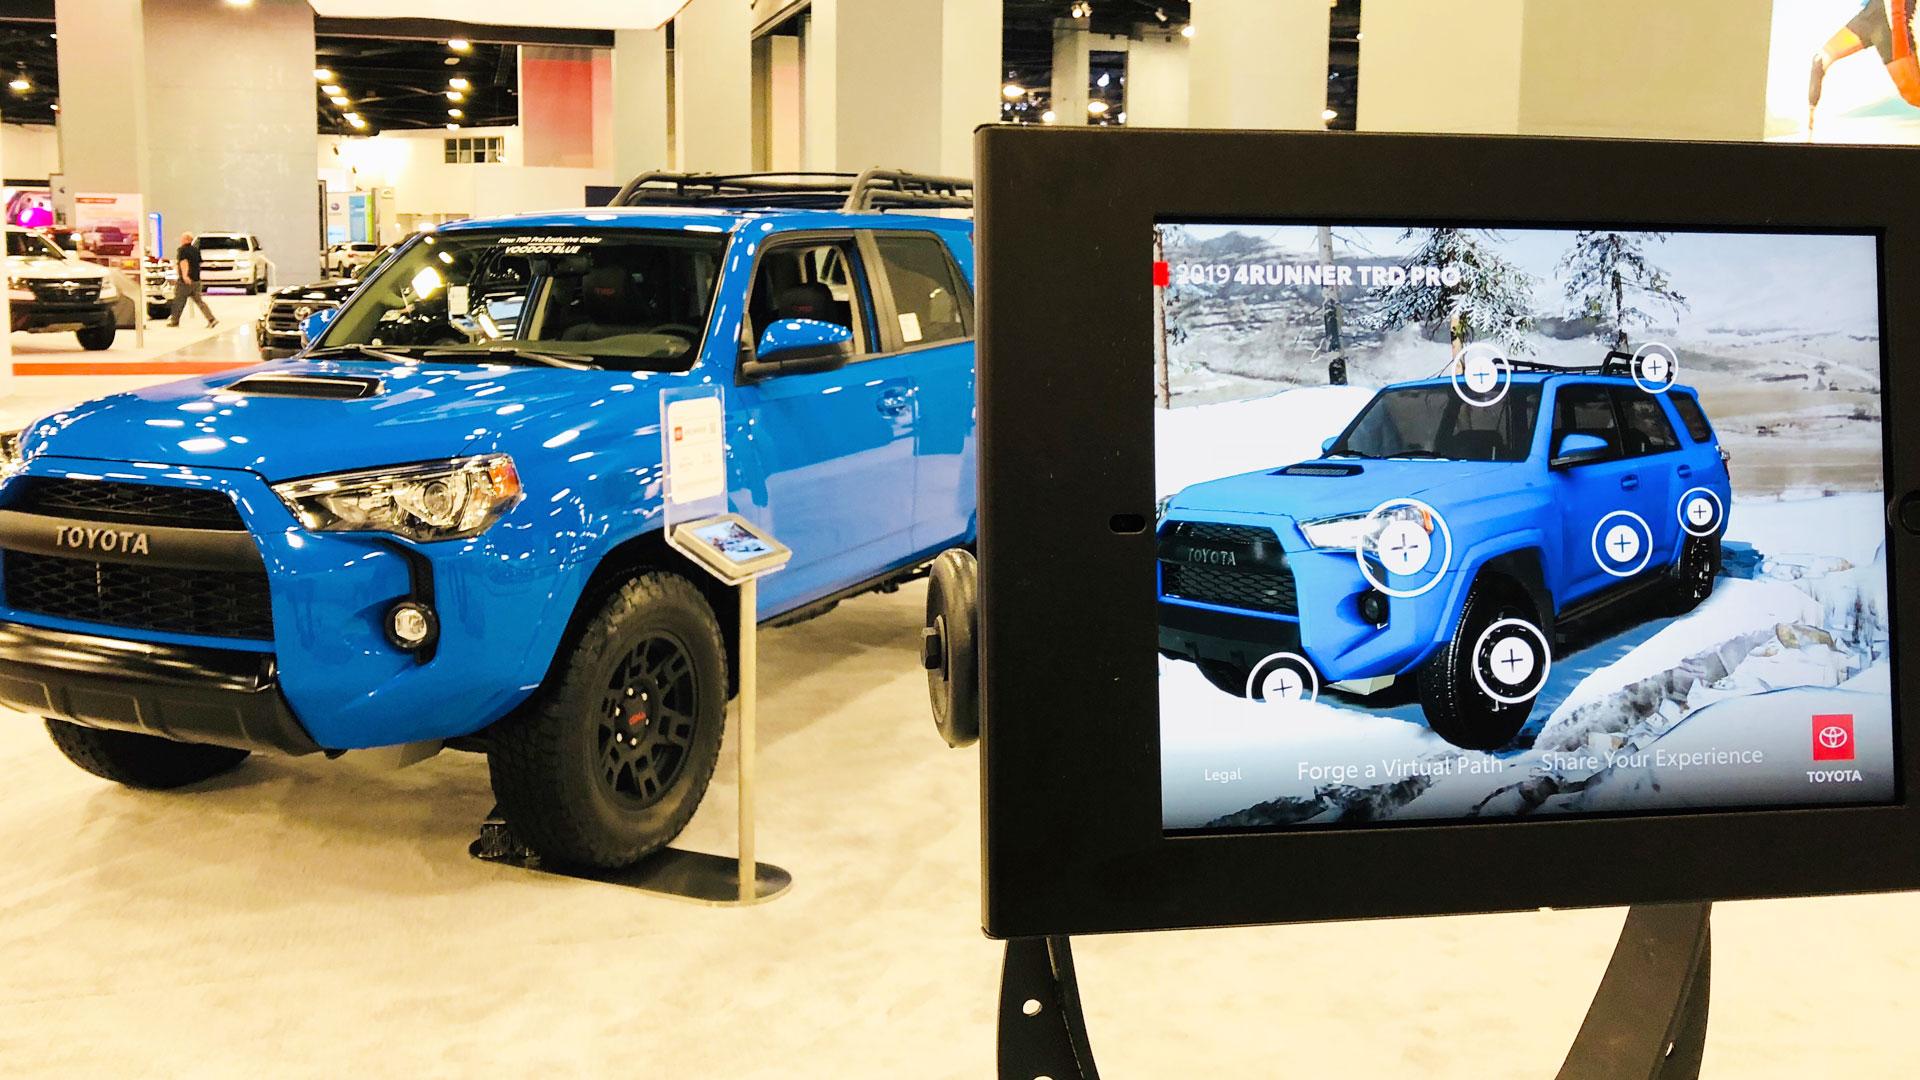 Toyota AR